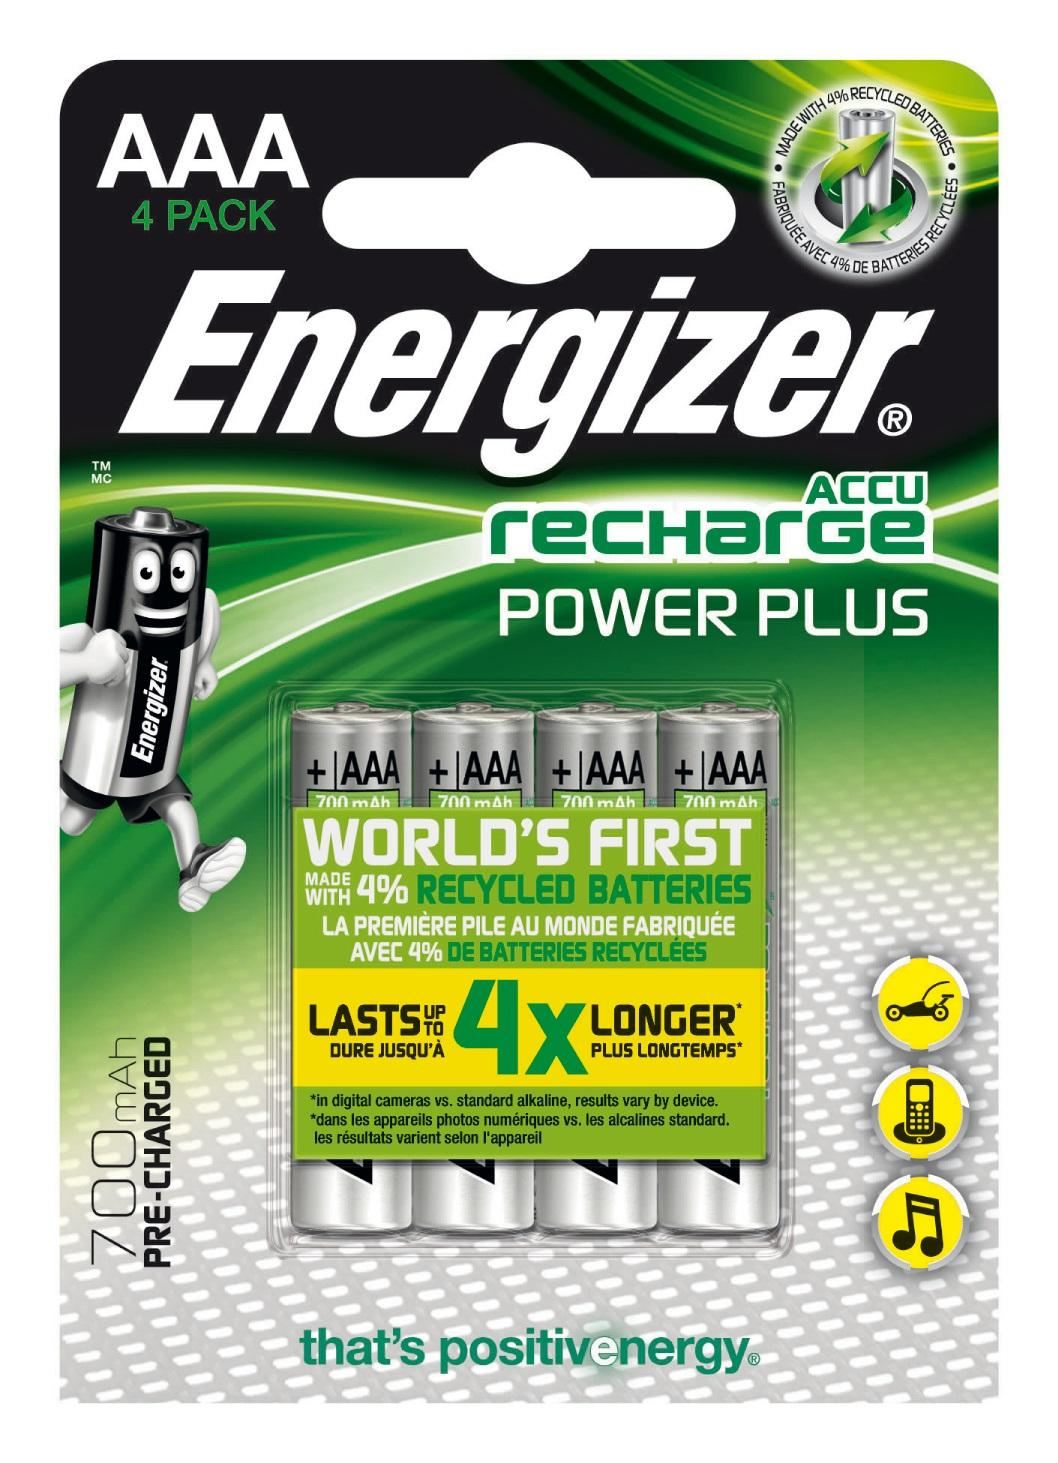 Energizer Accu Recharge Power Plus 700 AAA BP4 Batteria ricaricabile Nichel-Metallo Idruro (NiMH)